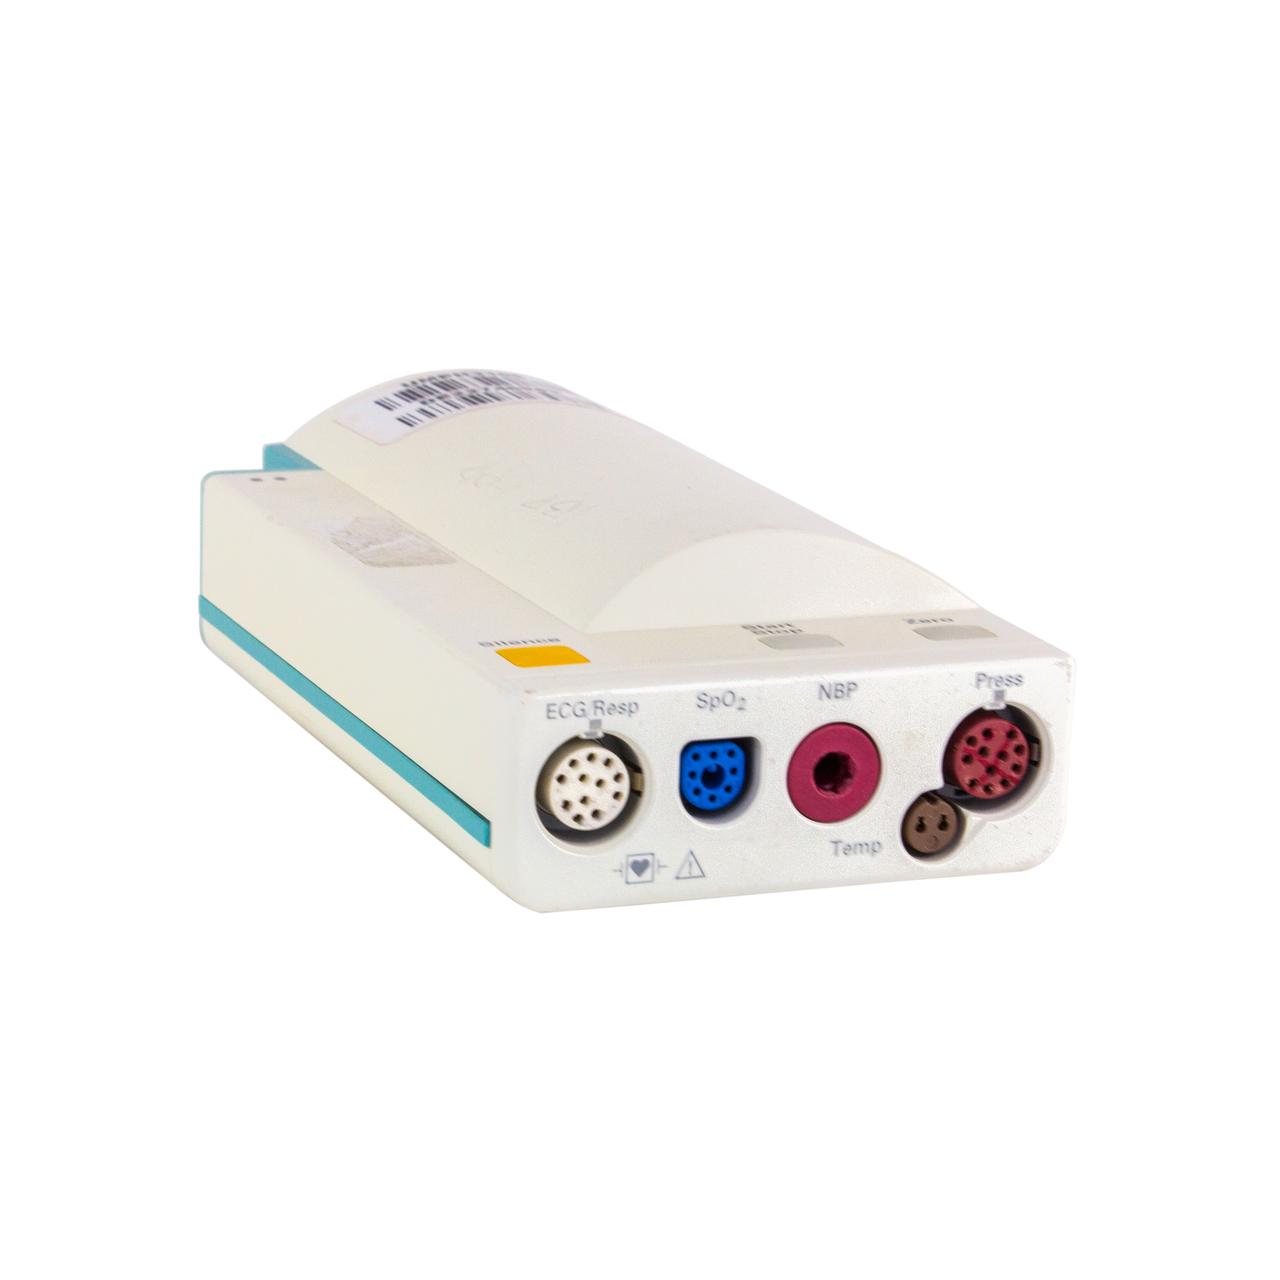 Philips Intellivue Module M3001A - A01C12 - Fast SPO2, NIBP, 12 ECG